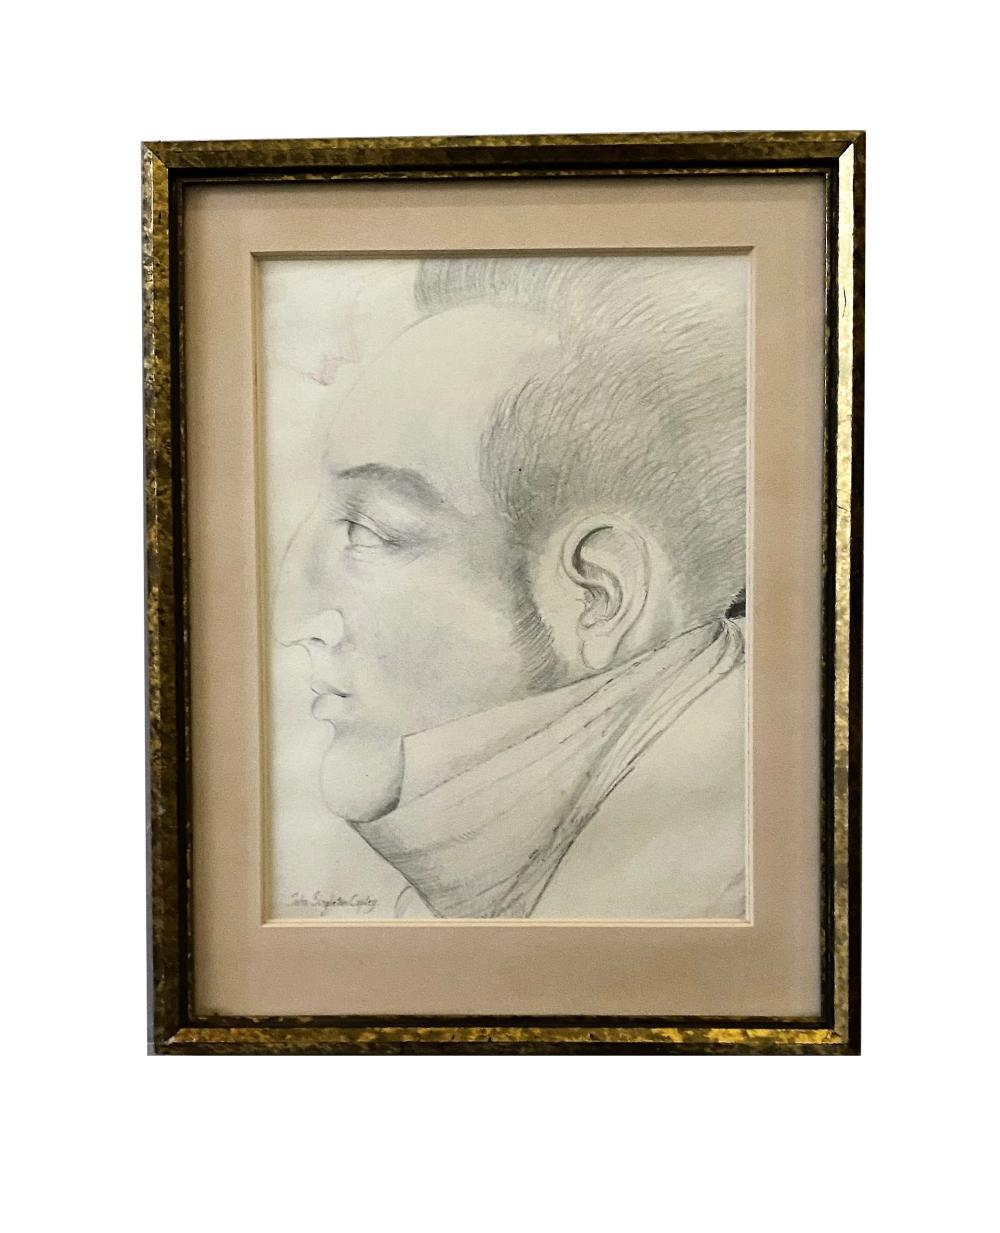 JOHN SINGLETON COPLEY WATSON SHARK OLD ART PAINTING PICTURE POSTER 1653OMLV